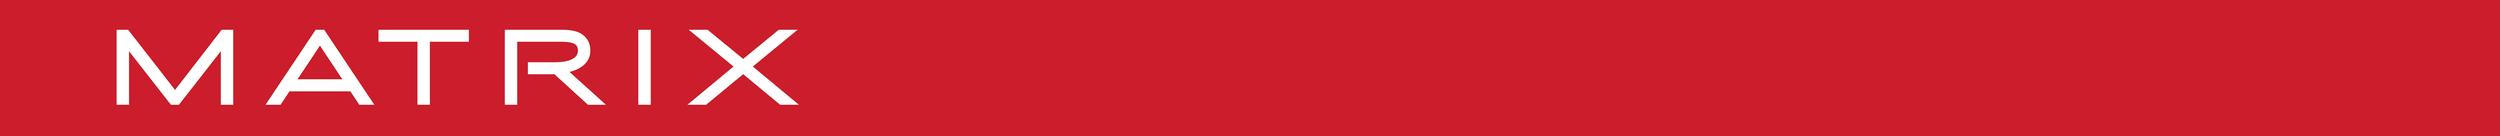 new-matrix-logo-in-banner_long.png